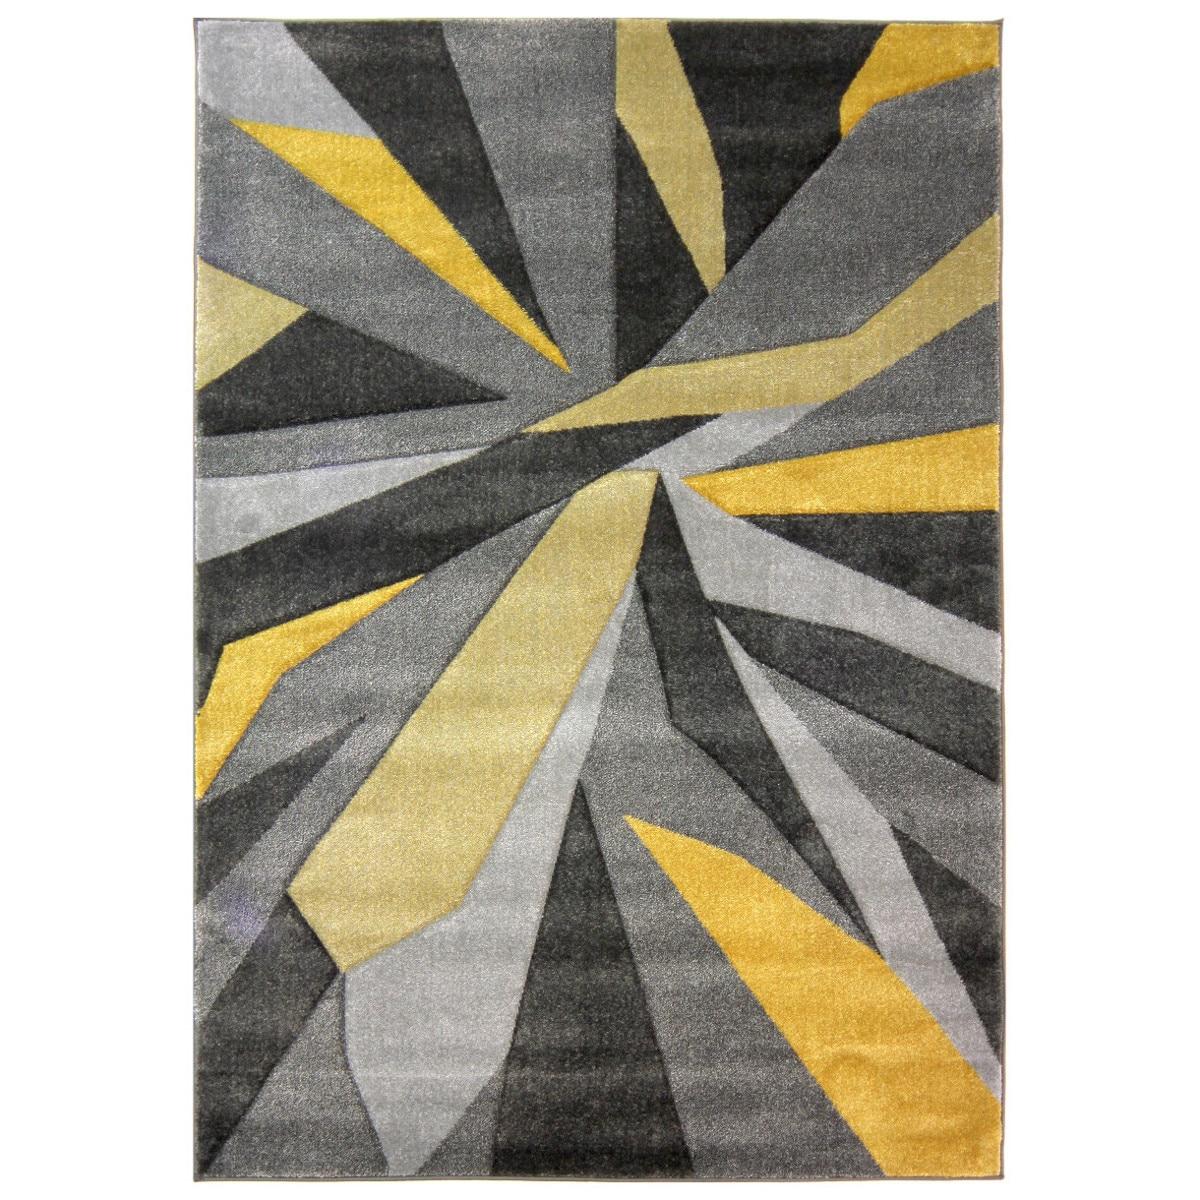 Szőnyeg Decorino C02 204702, Polipropilén, 160x230 cm eMAG.hu